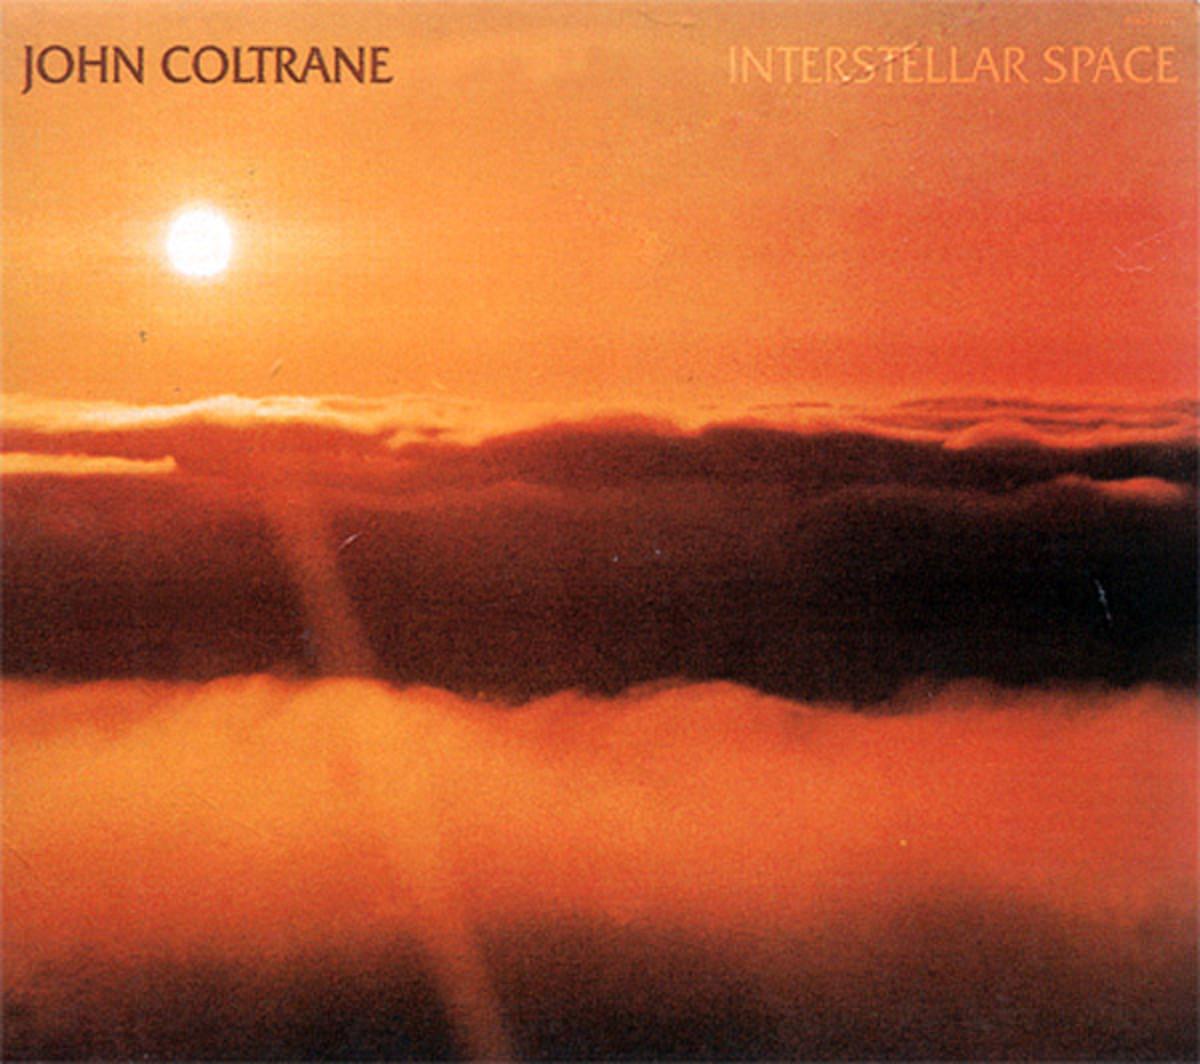 """Interstellar Space"" cover art"